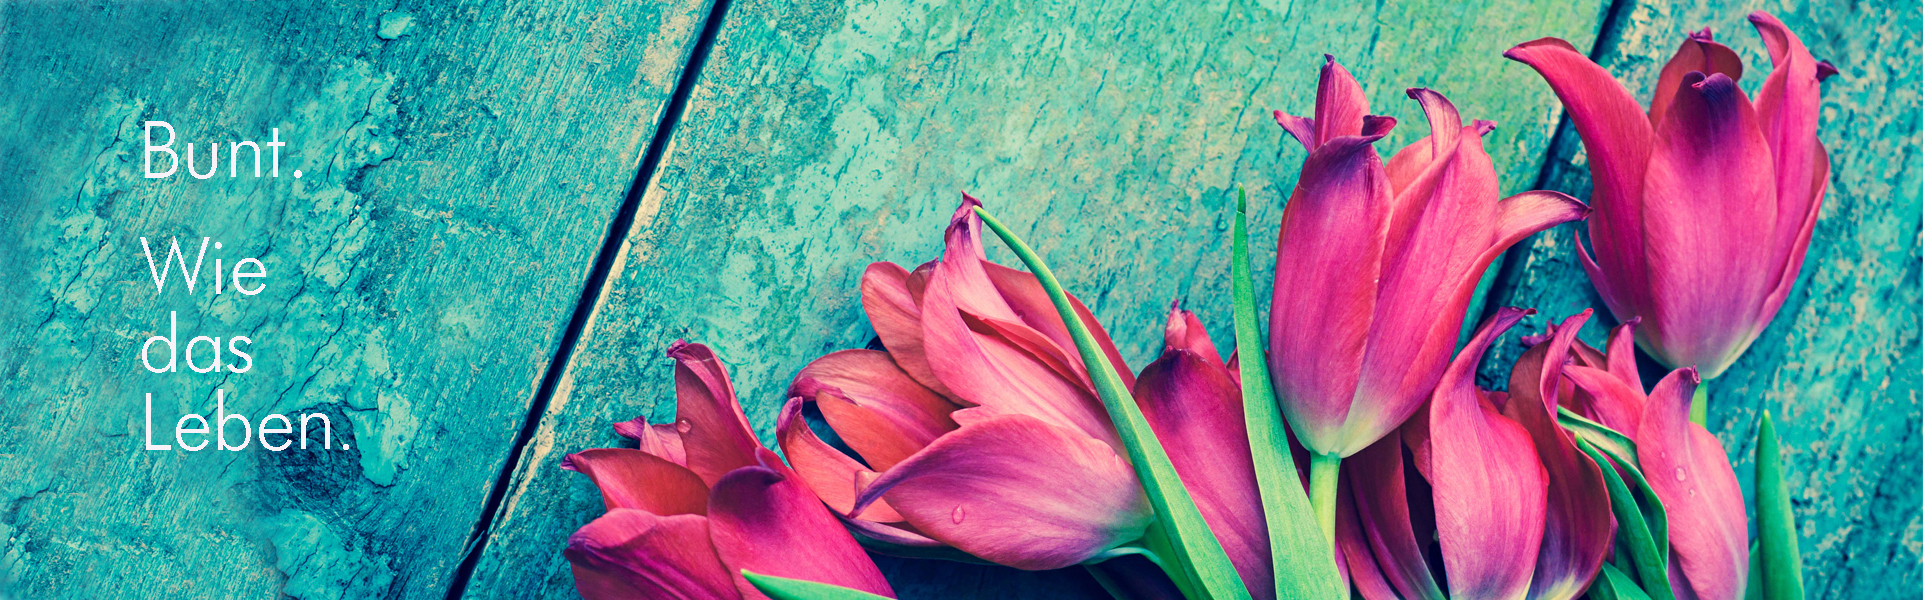 Carpe Diem Floristik in Wuppertal Elberfeld - Blumen für